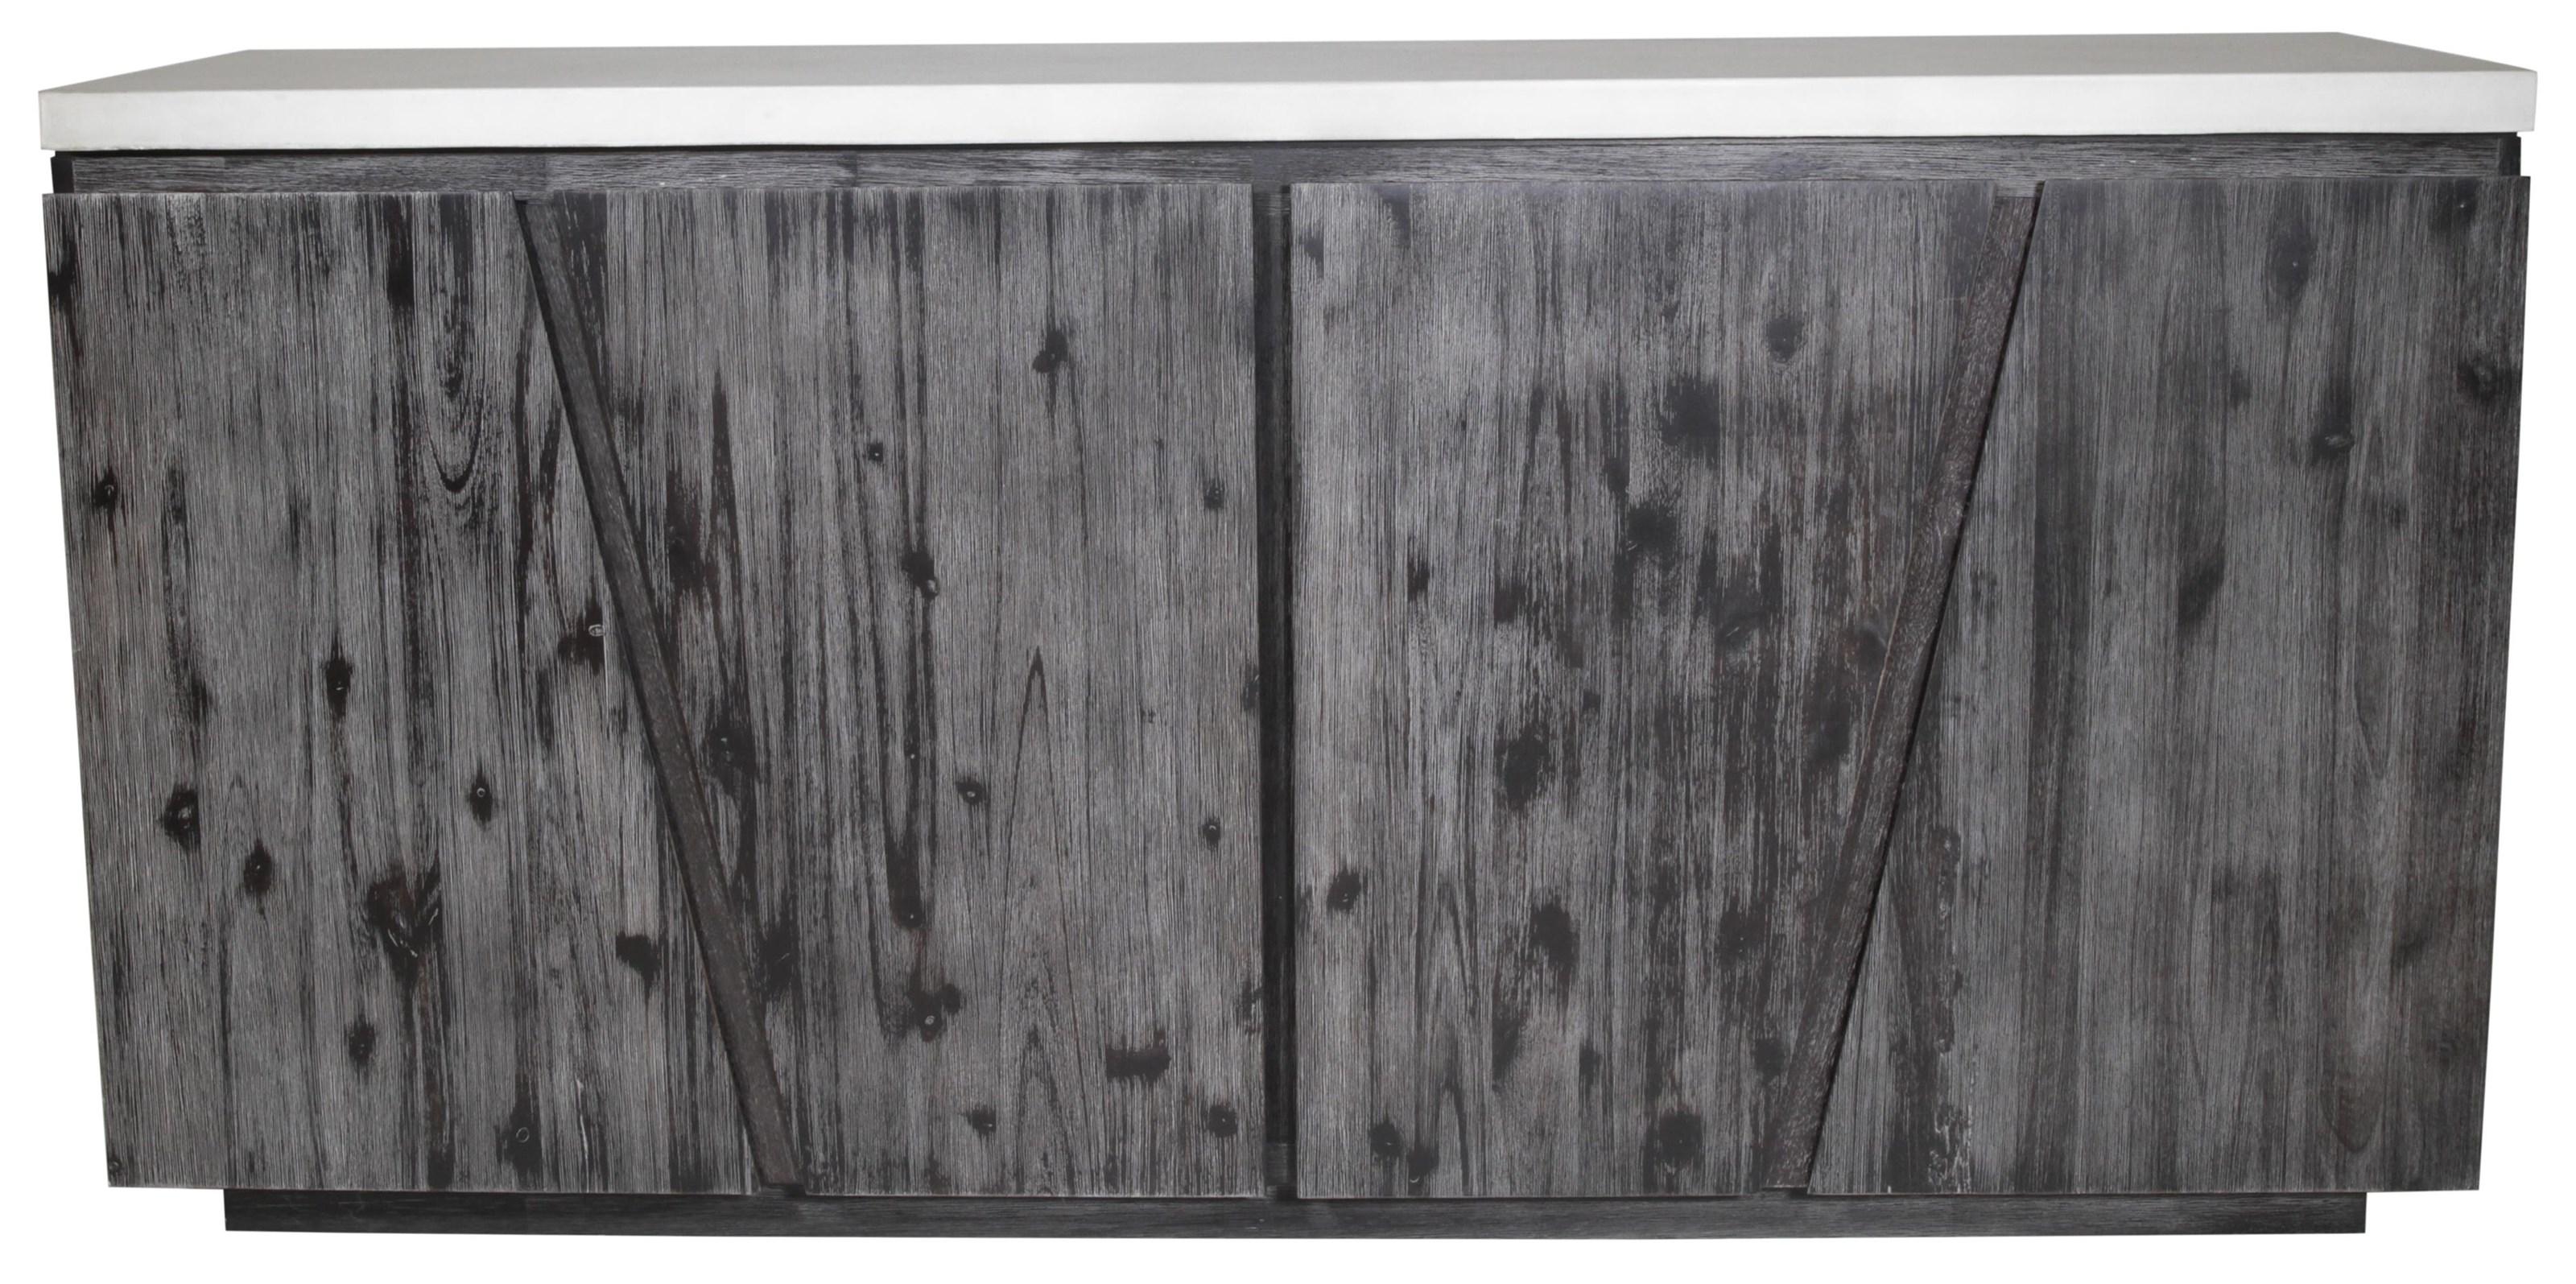 Austin Sideboard by Global Home at HomeWorld Furniture